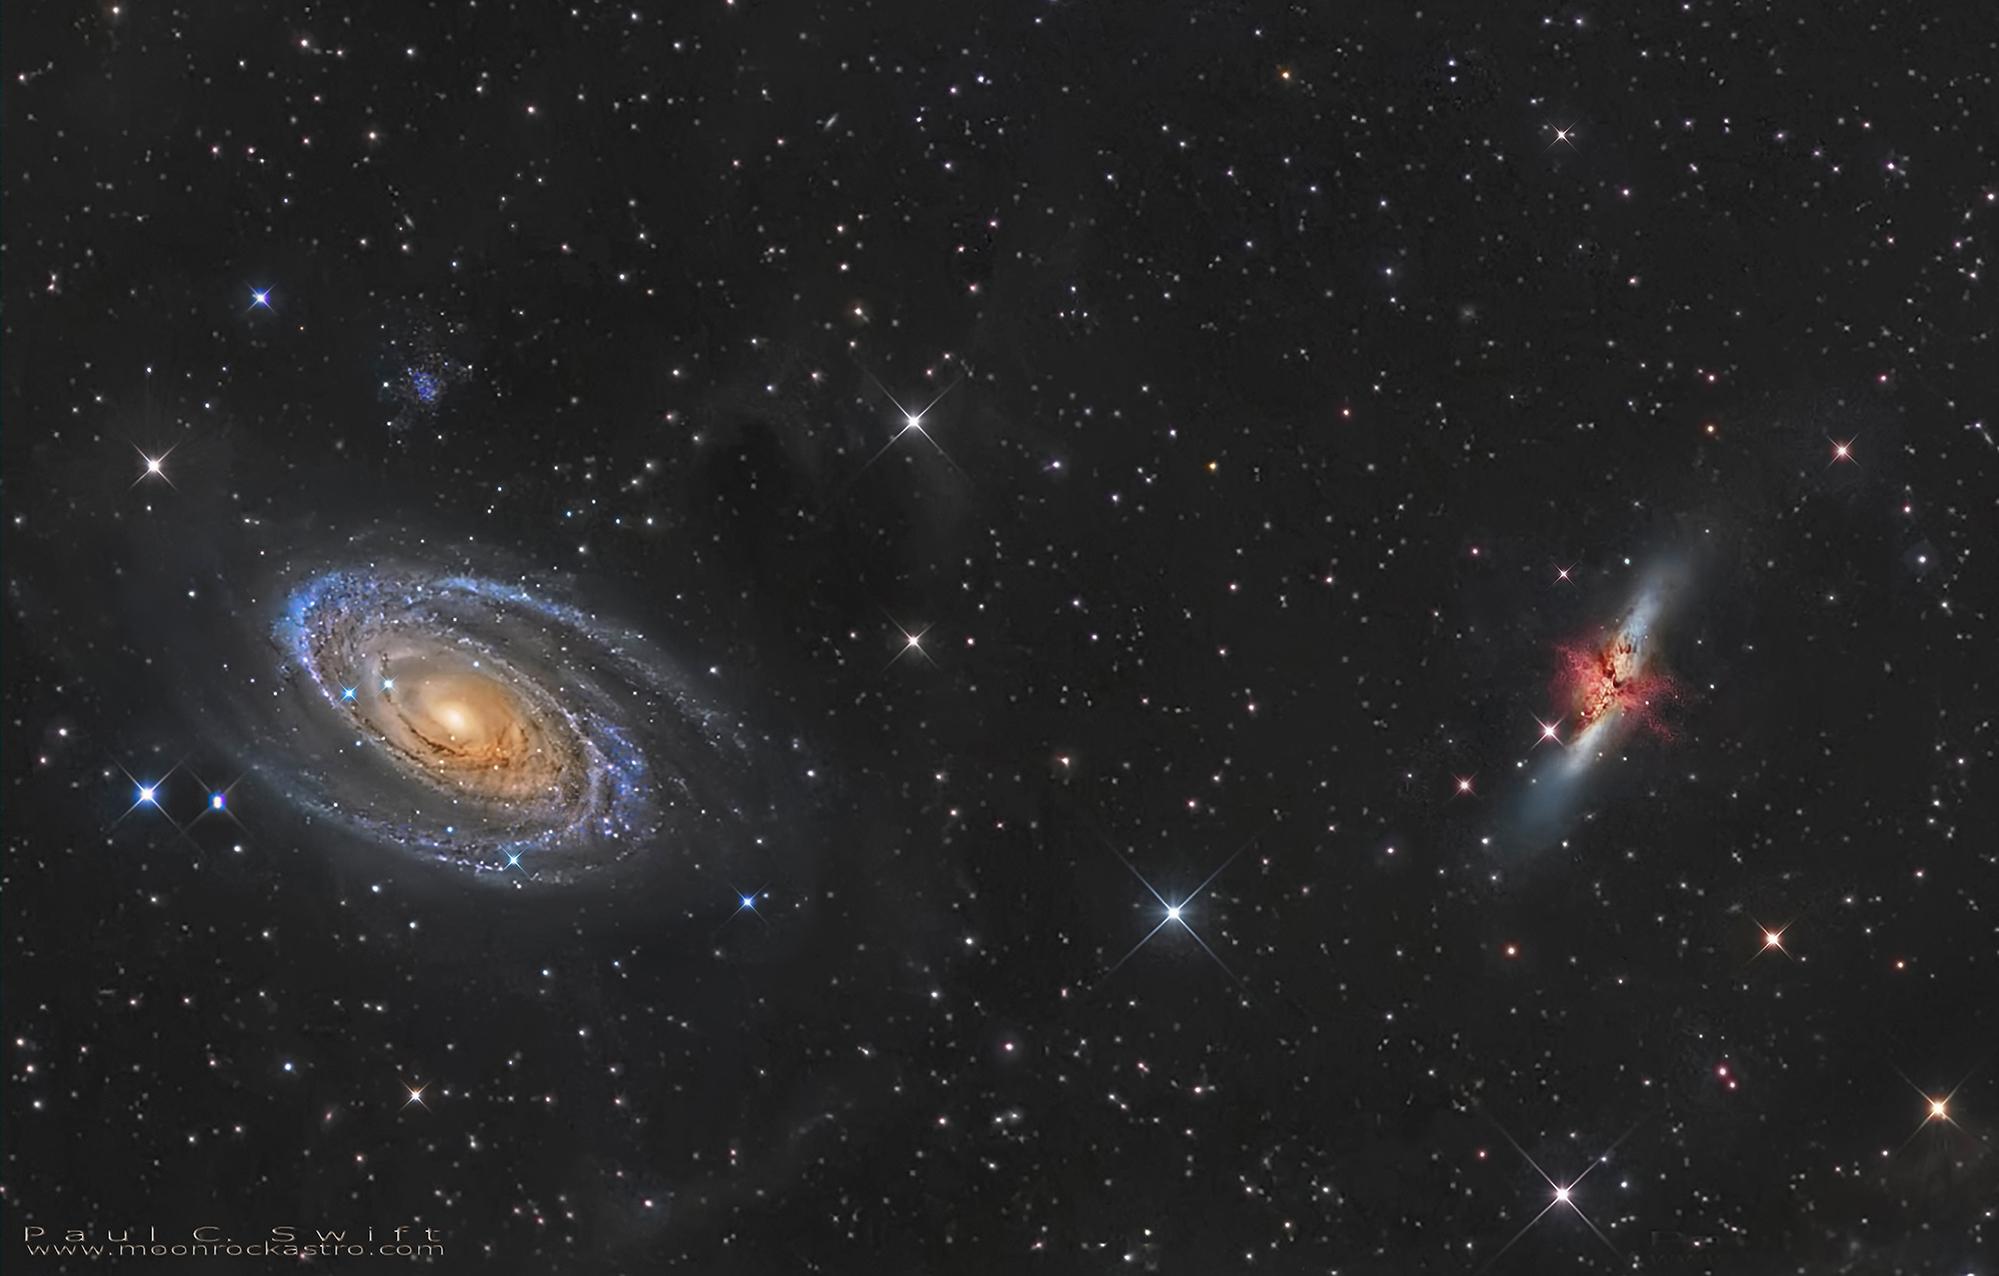 M 82, NGC 3034, M 81, Bode's nebulae, NGC 3031.